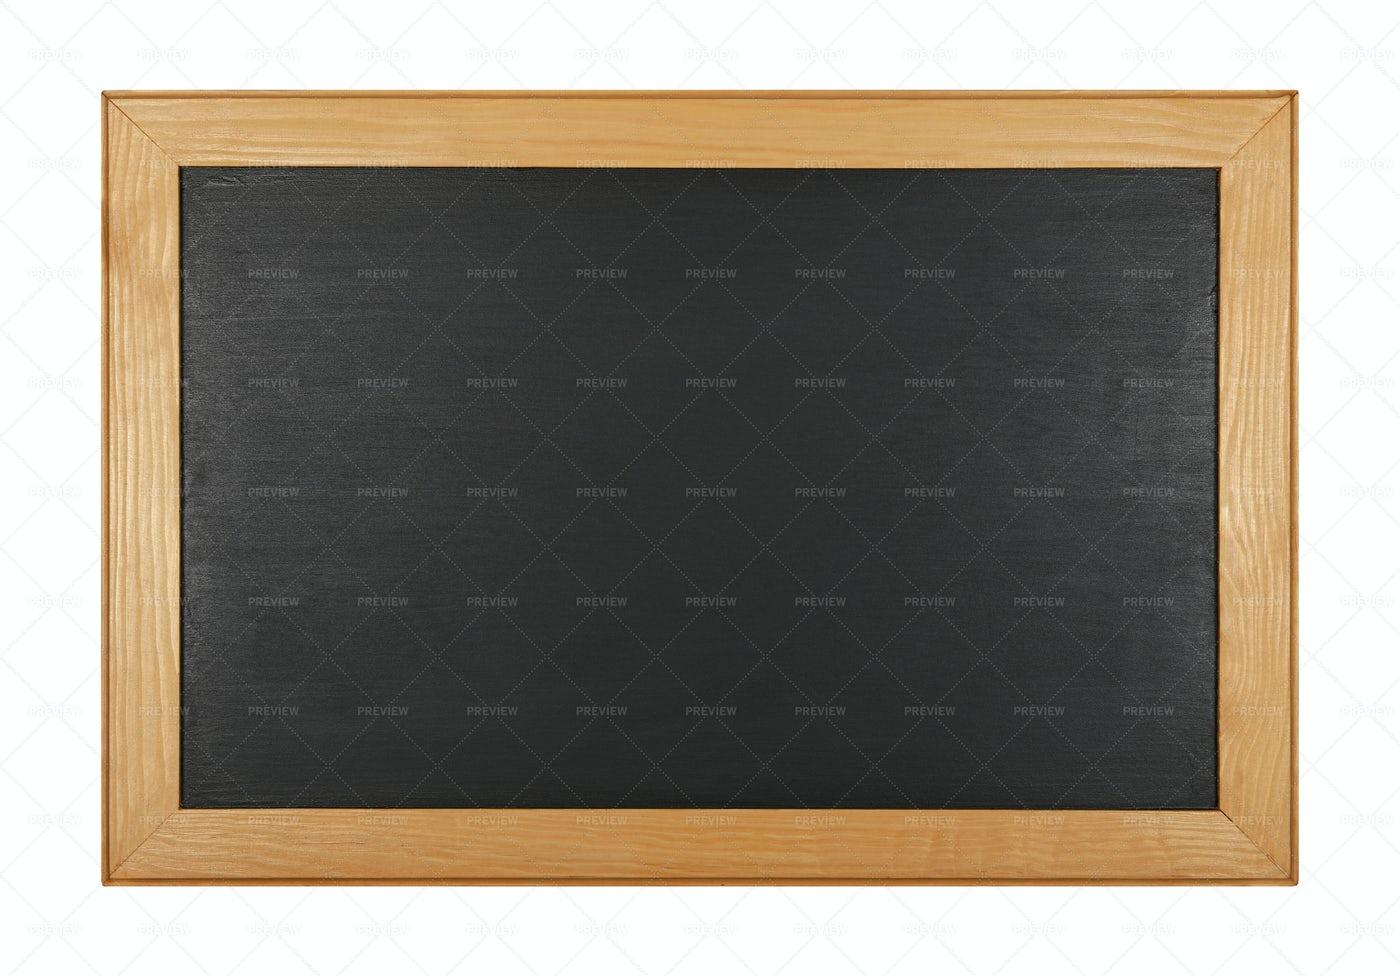 Black School Chalkboard: Stock Photos